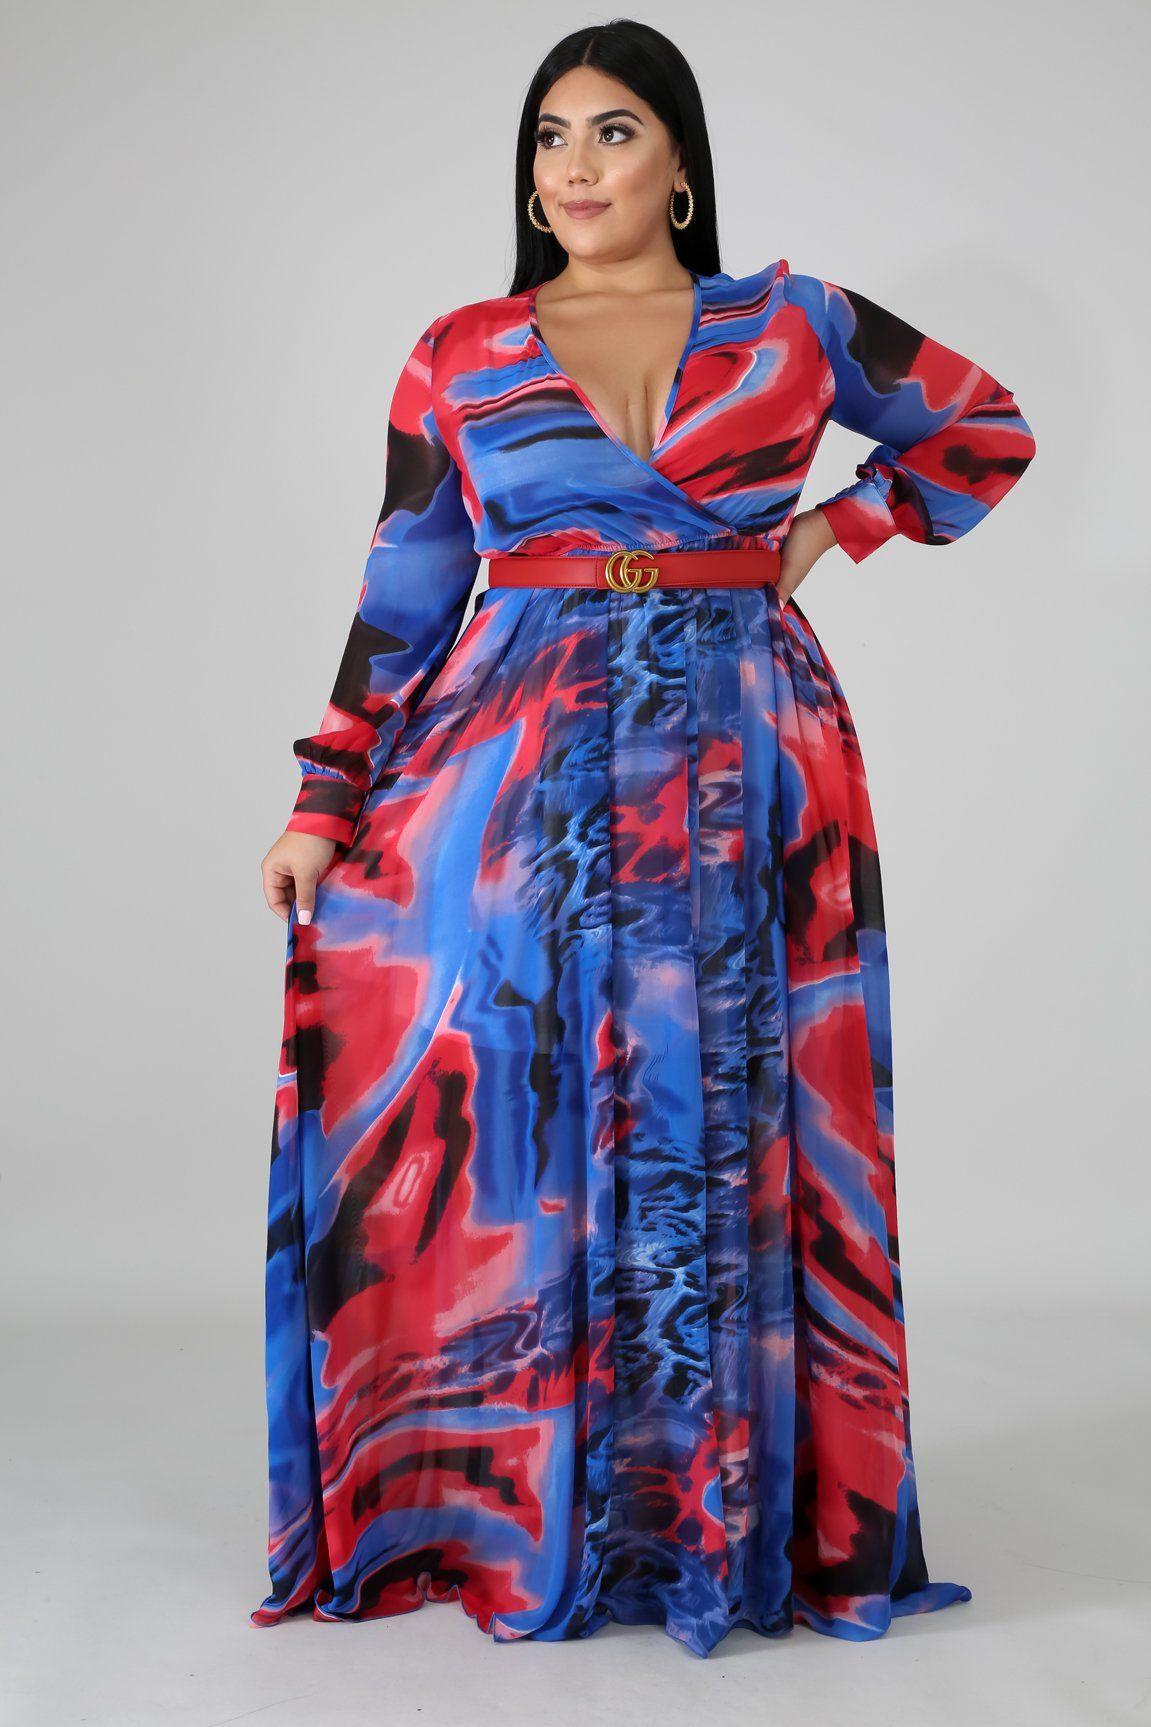 Color Swirl Maxi Dress Style Gt19203 Xdescriptionthis Color Swirl Maxi Dress Features A Non Stretchy Fa Long Dress Fashion Maxi Dress Plus Size Maxi Dresses [ 1727 x 1151 Pixel ]